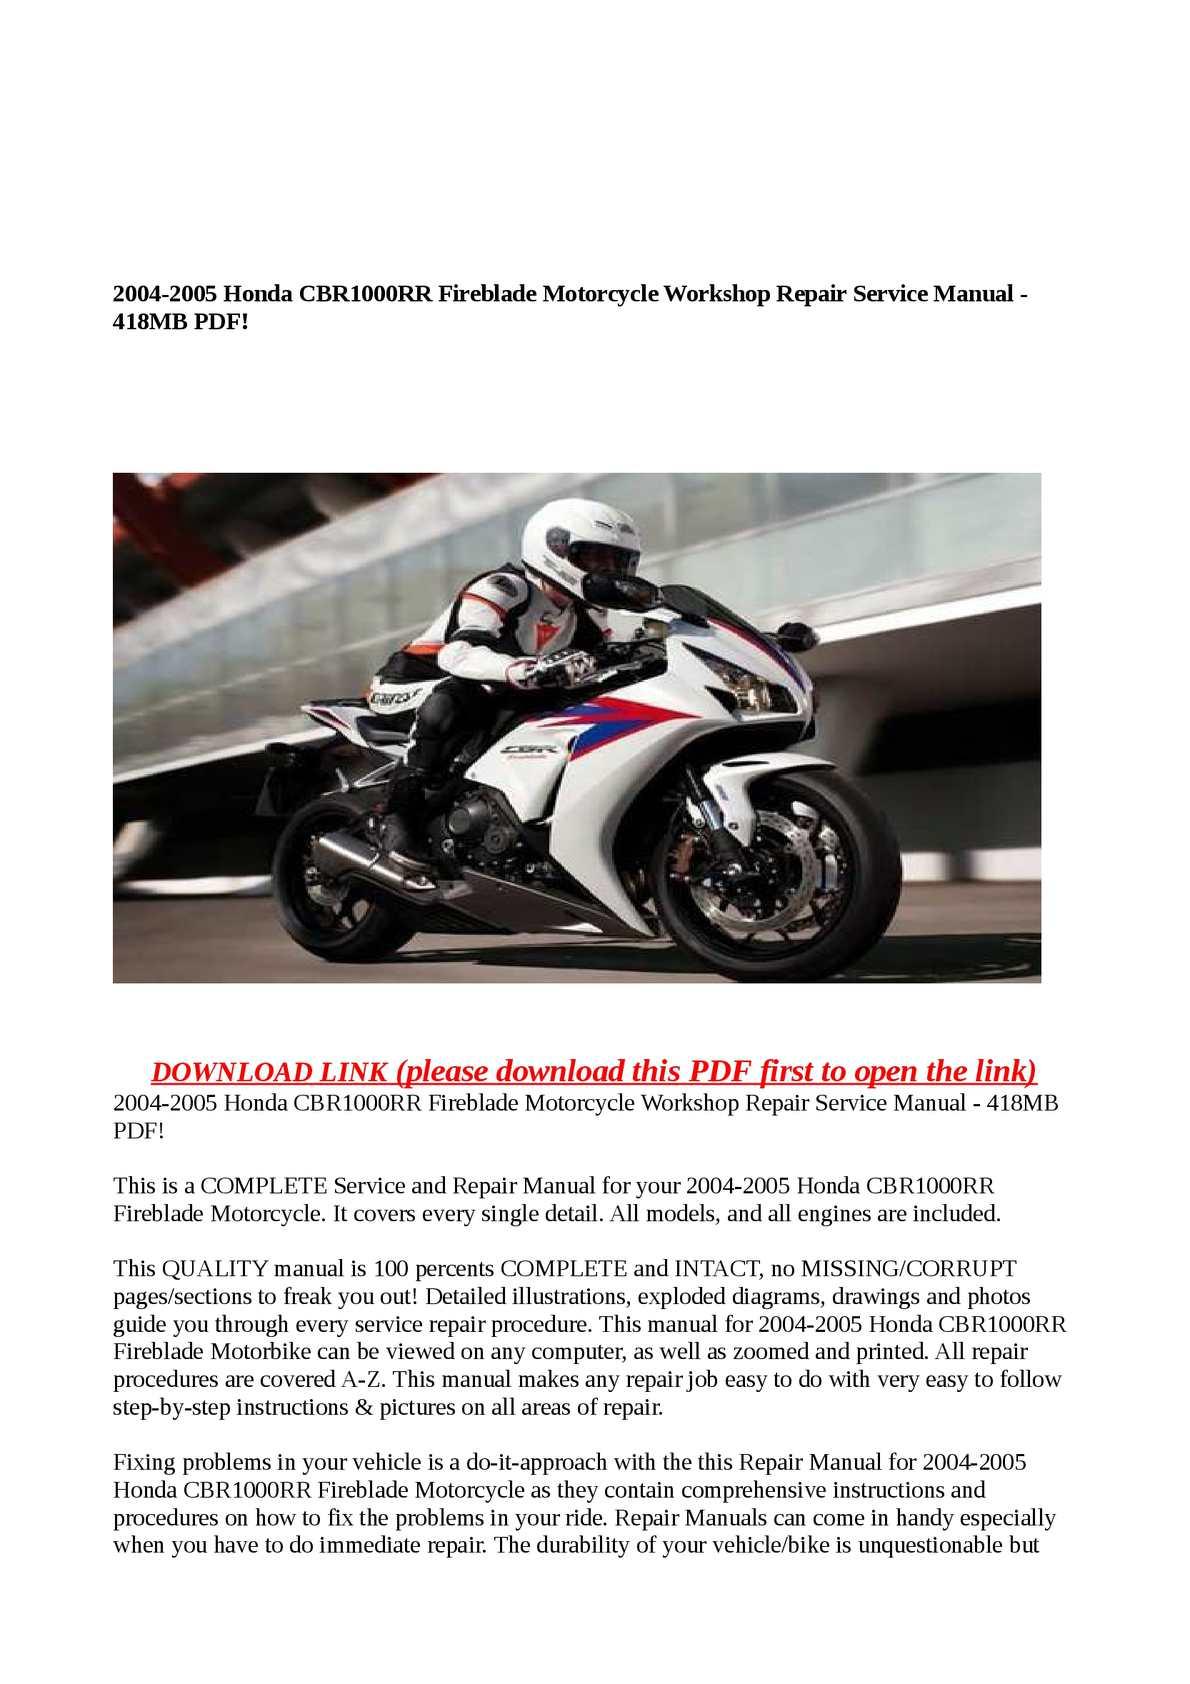 hight resolution of 2004 2005 honda cbr1000rr fireblade motorcycle workshop repair service manual 418mb pdf